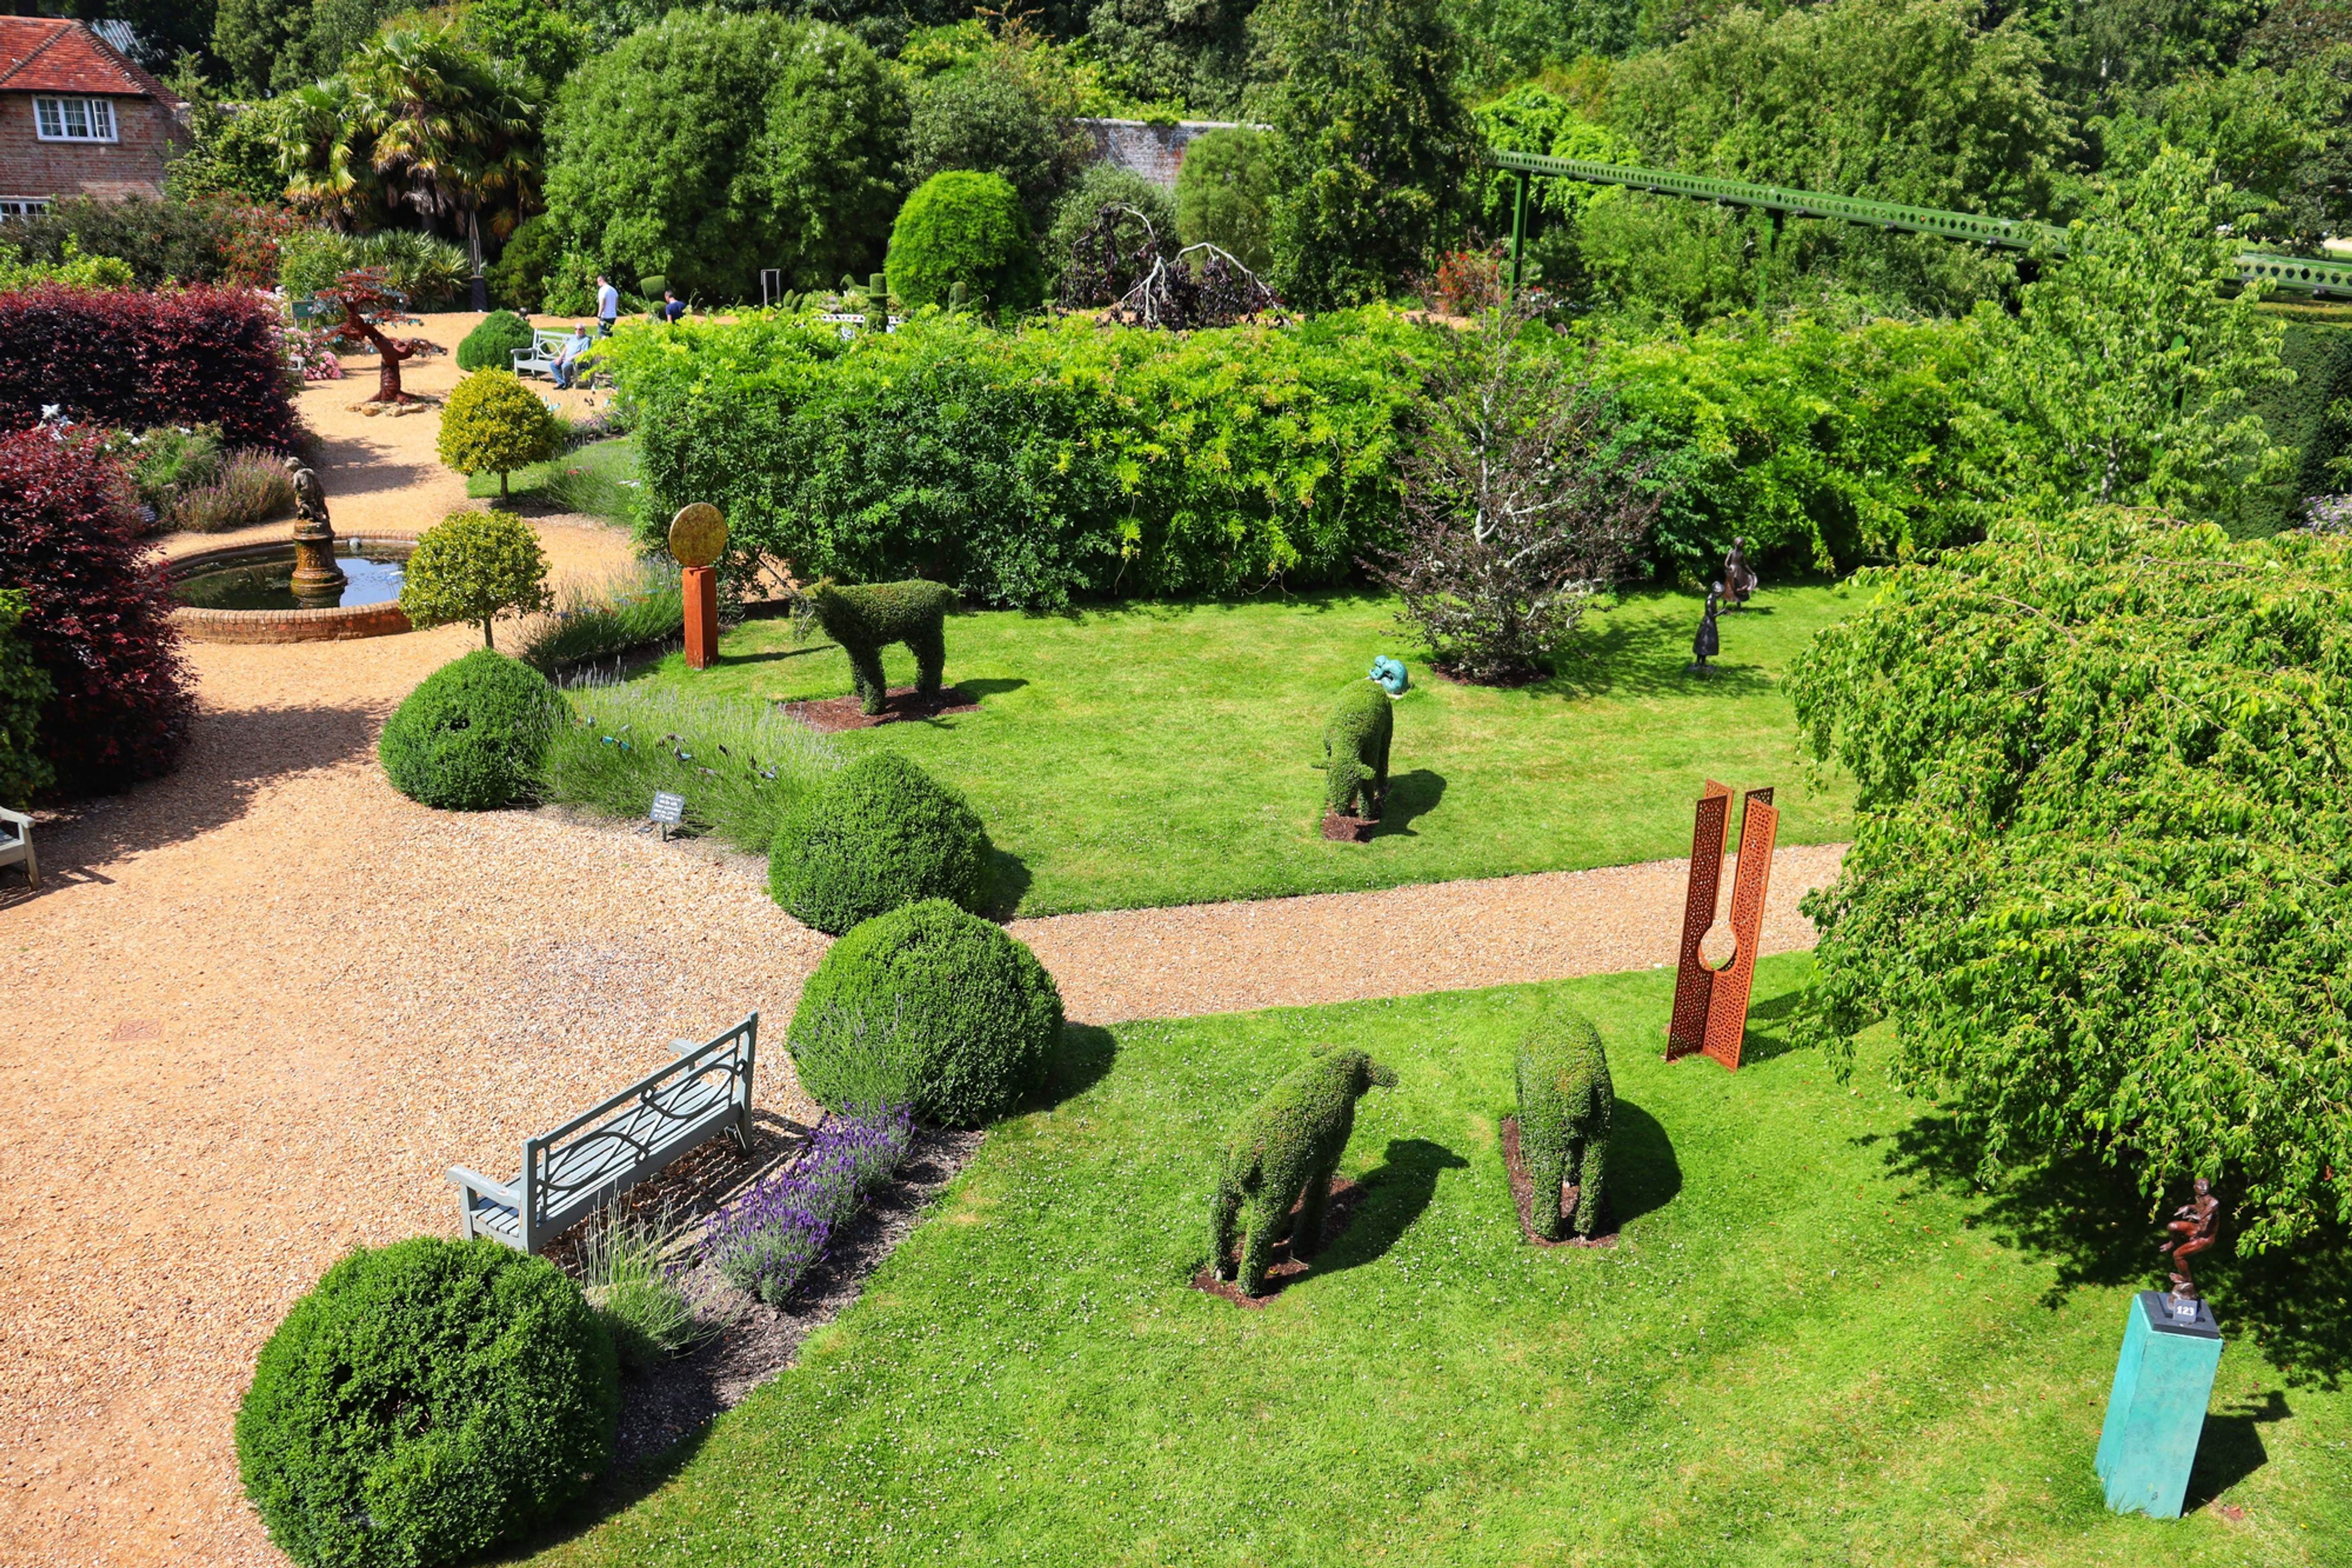 Lawn and Garden Rejuvenator